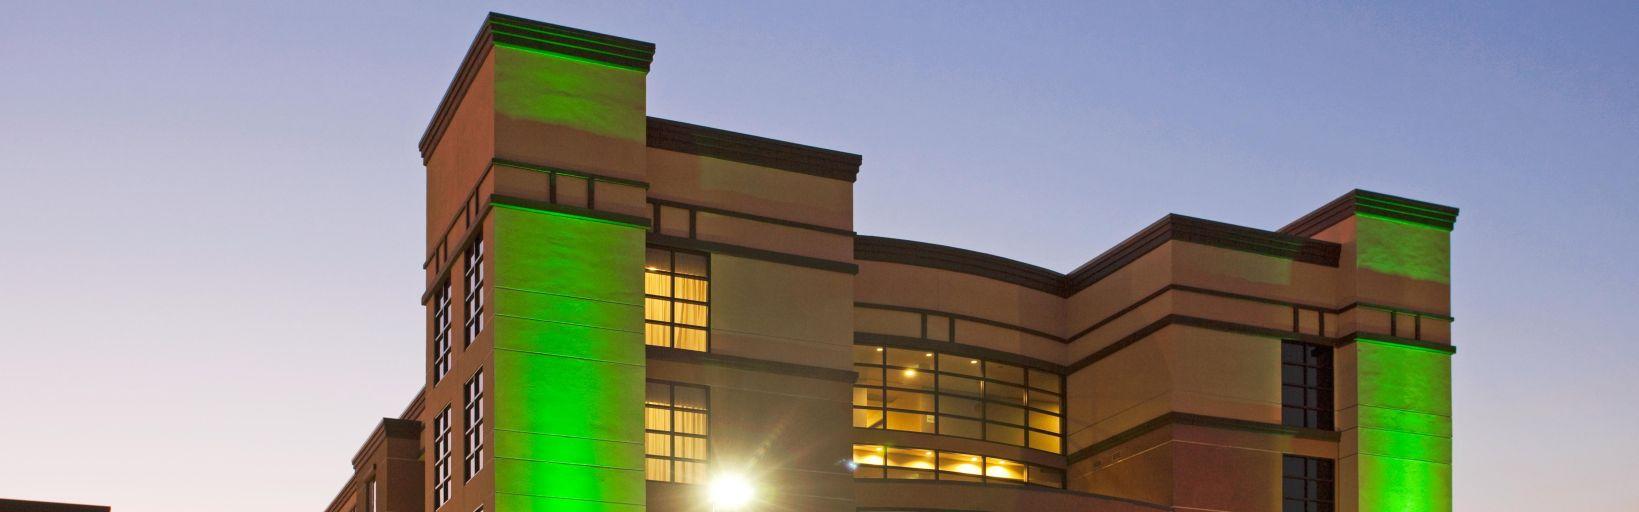 Holiday Inn Irvine South/Irvine Spectrum Hotel by IHG